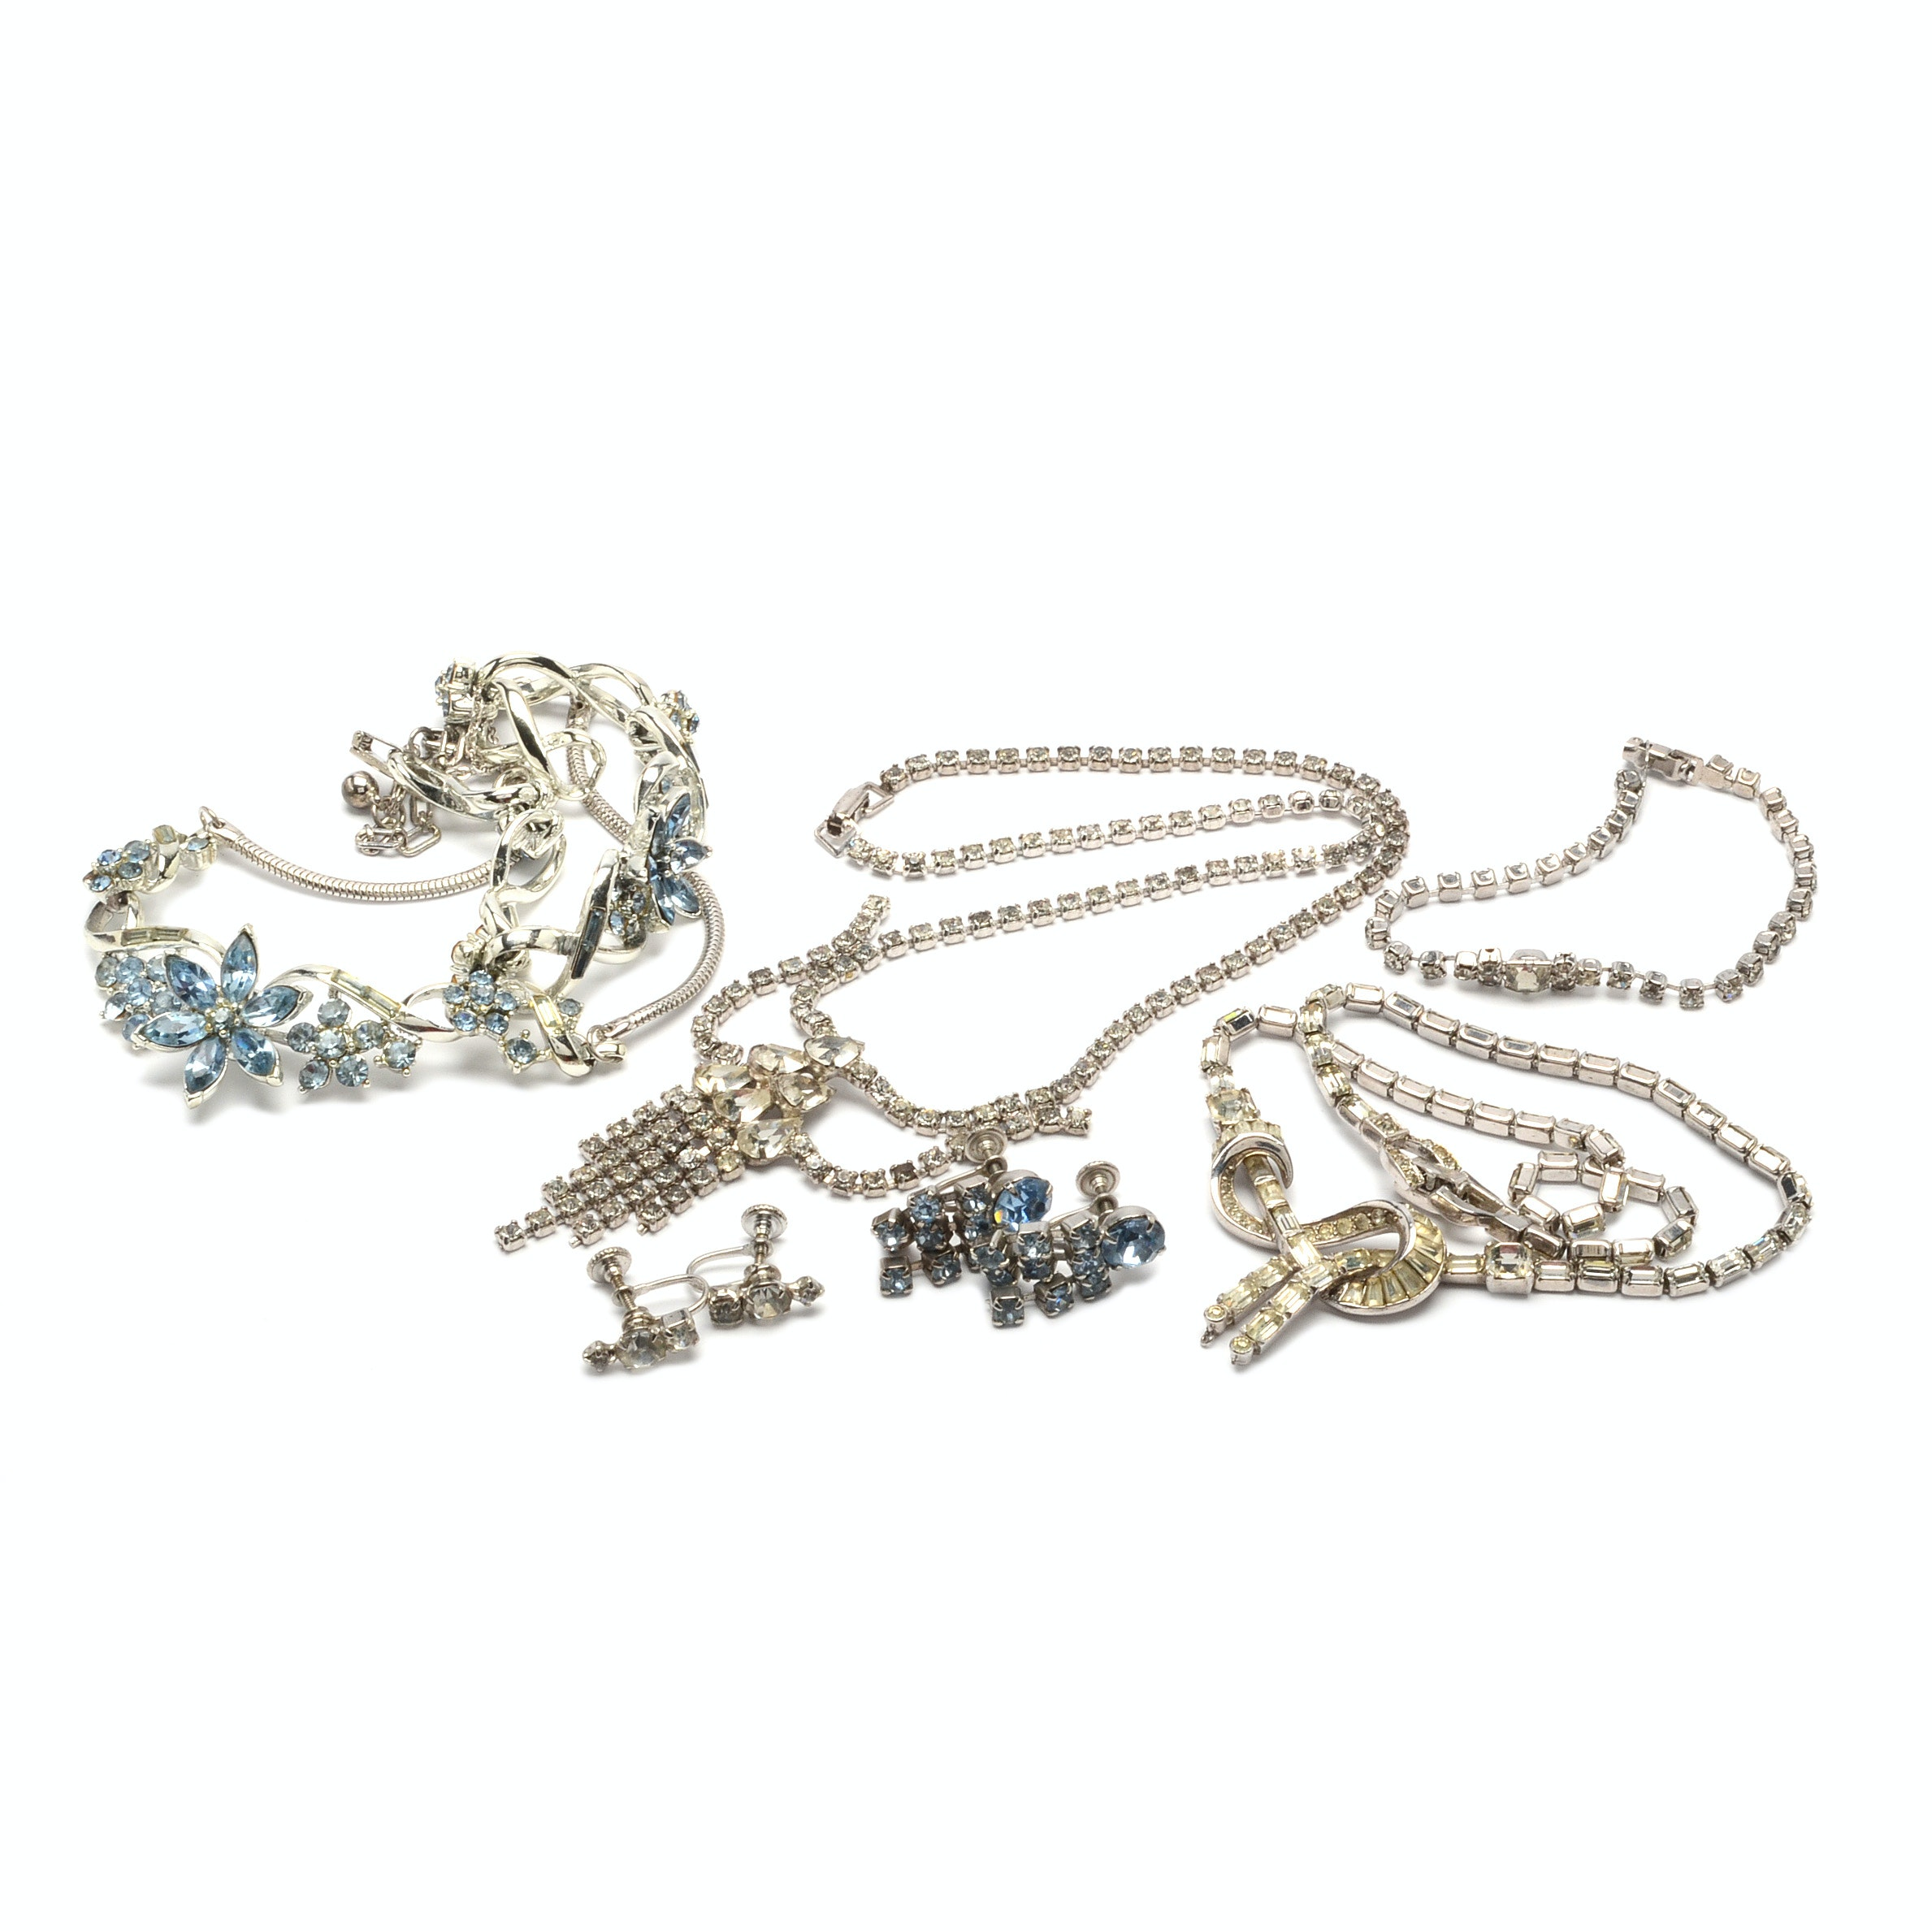 Vintage Rhinestone Jewelry Including Weiss